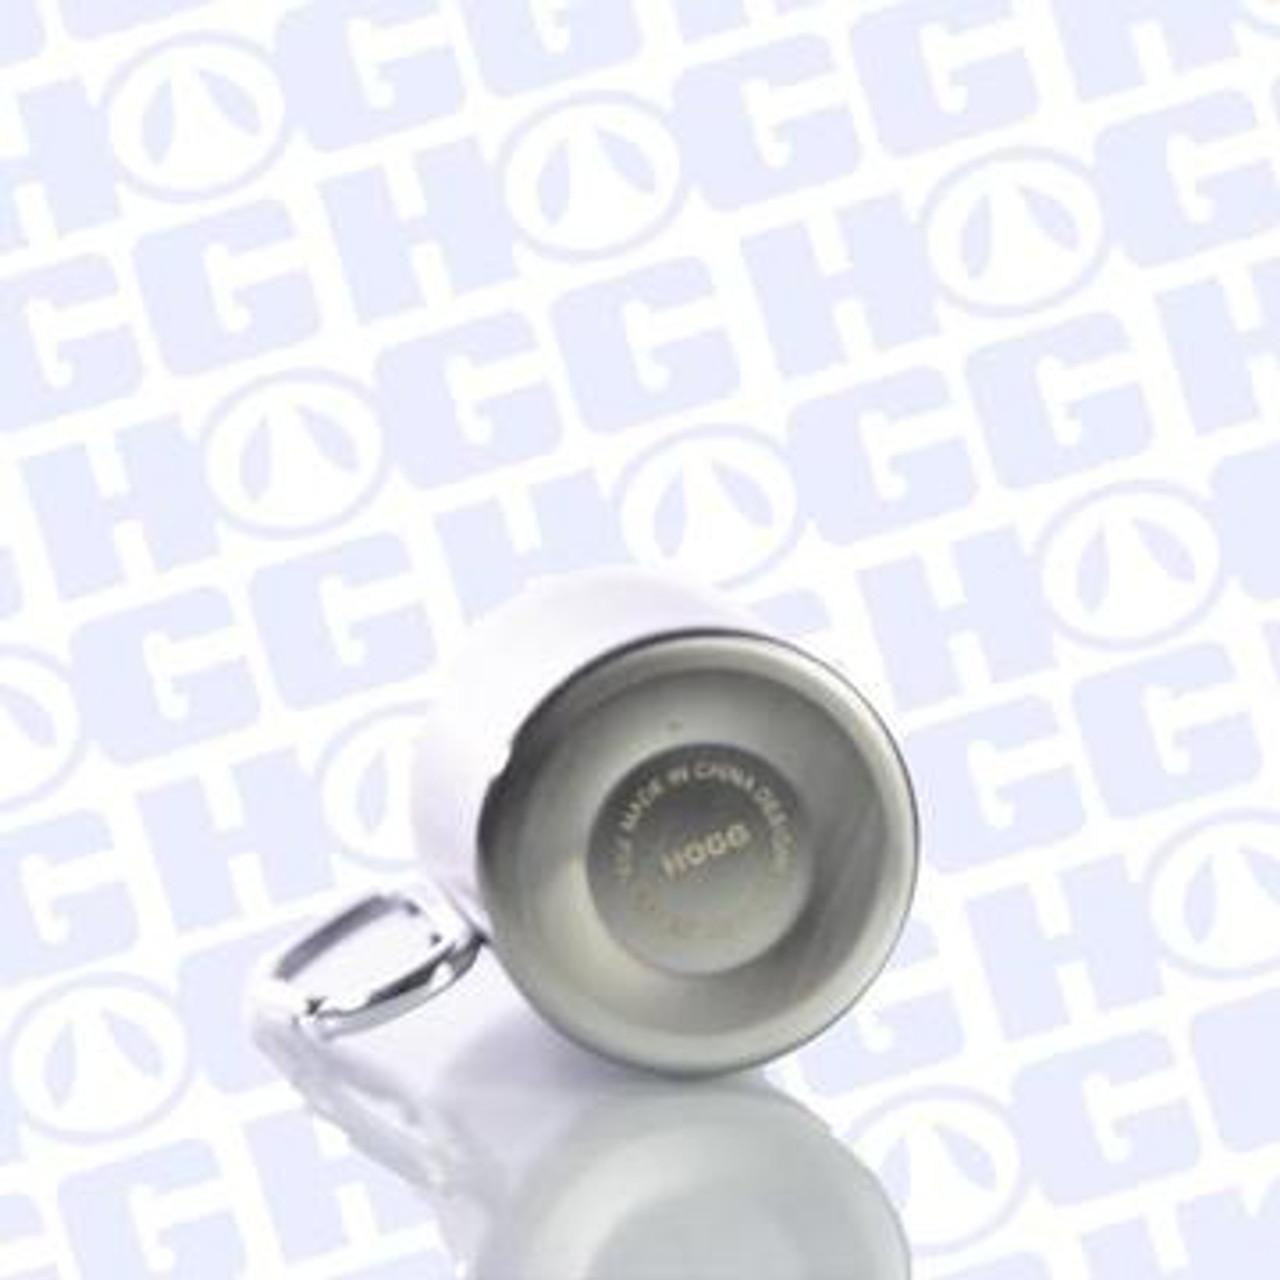 Carabiner Mug - 10oz - Stainless Steel